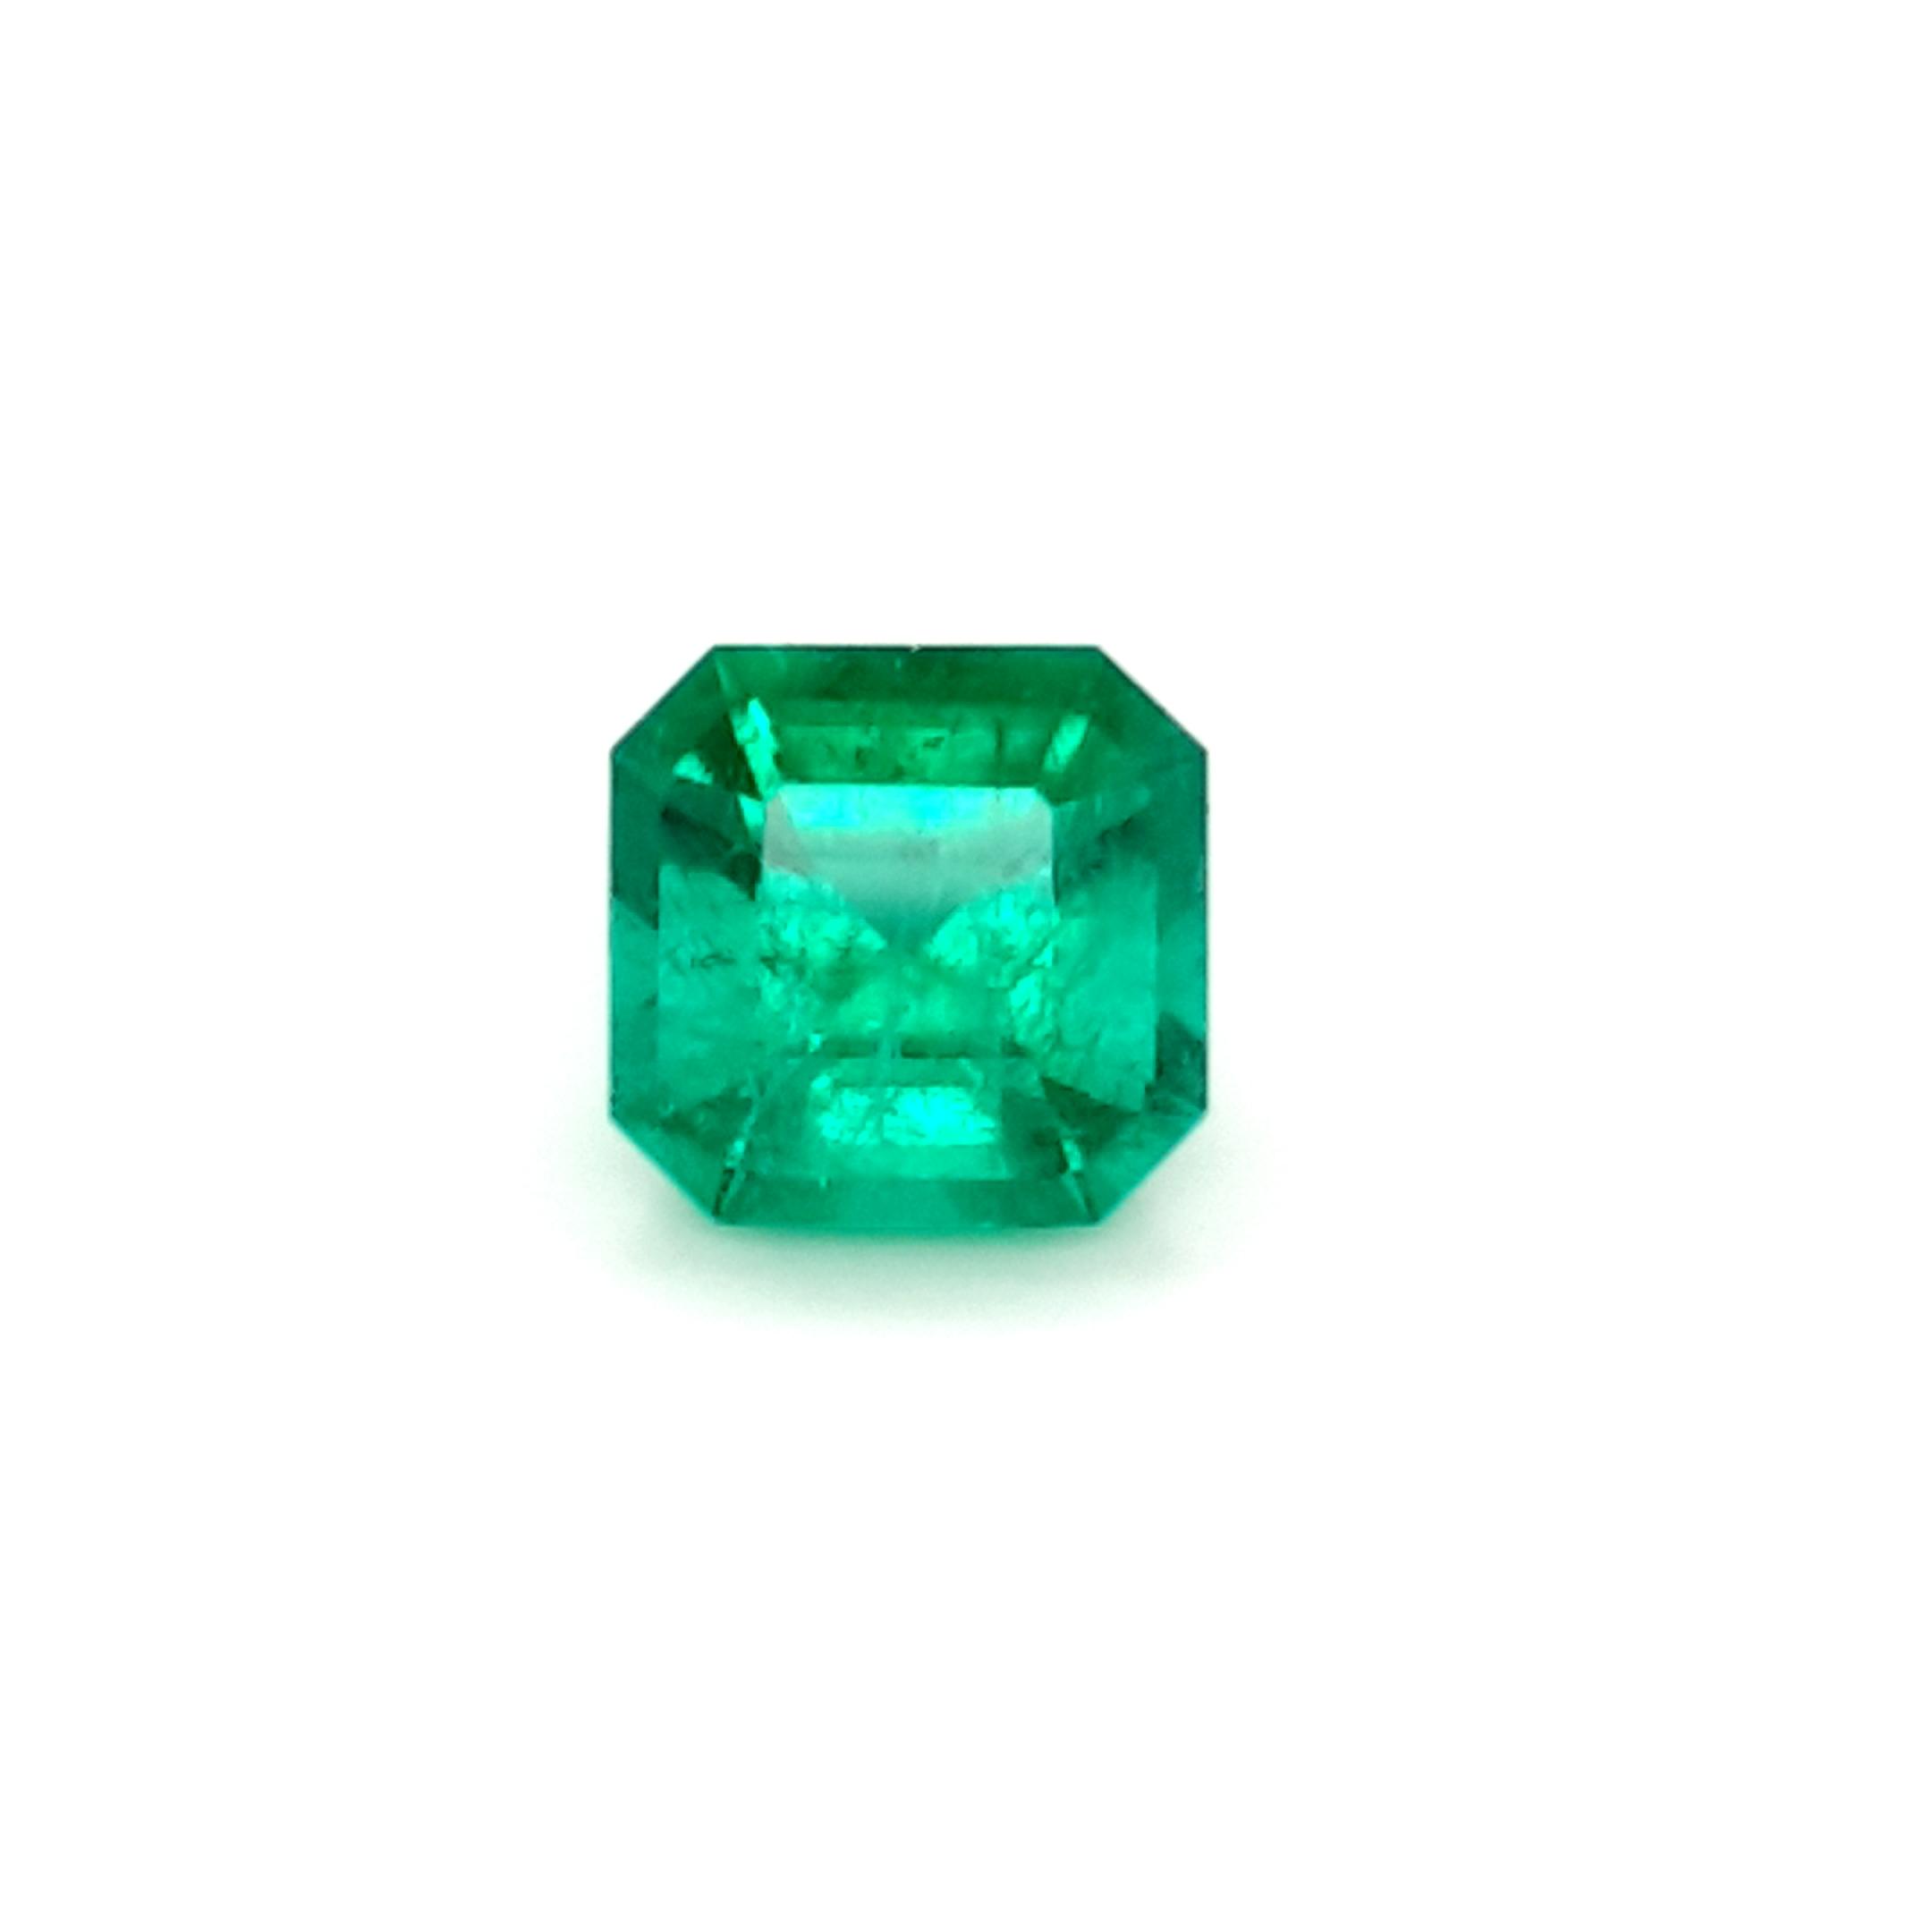 3,24ct. Emerald from Colombia MuzoGreen cert. EMI20C16 ClaudiaHamann__2021-03-25-17-27-27